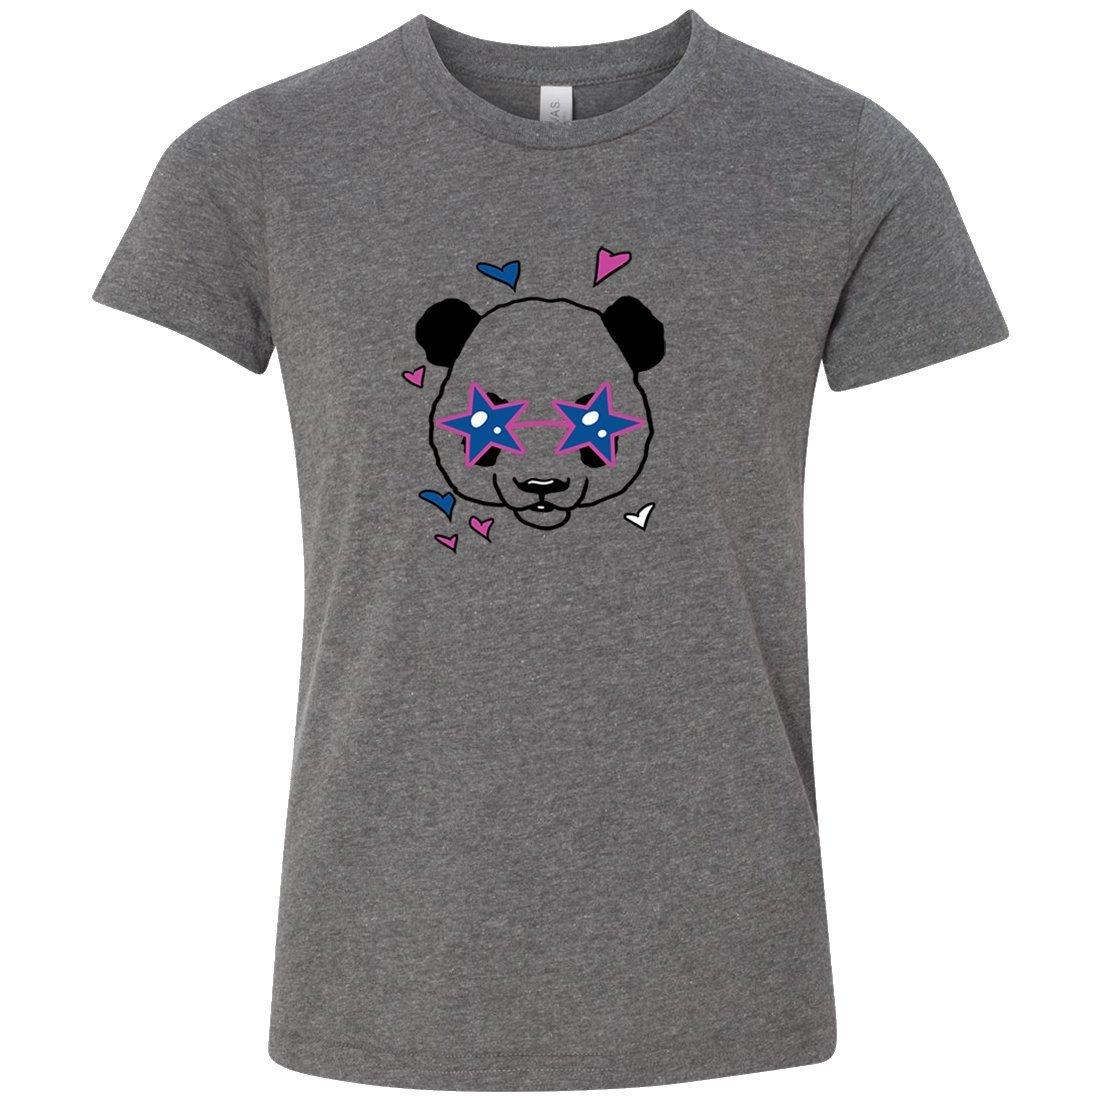 Cute Panda Star Glasses Premium Youth T-Shirt/tee - Deep Heather Small